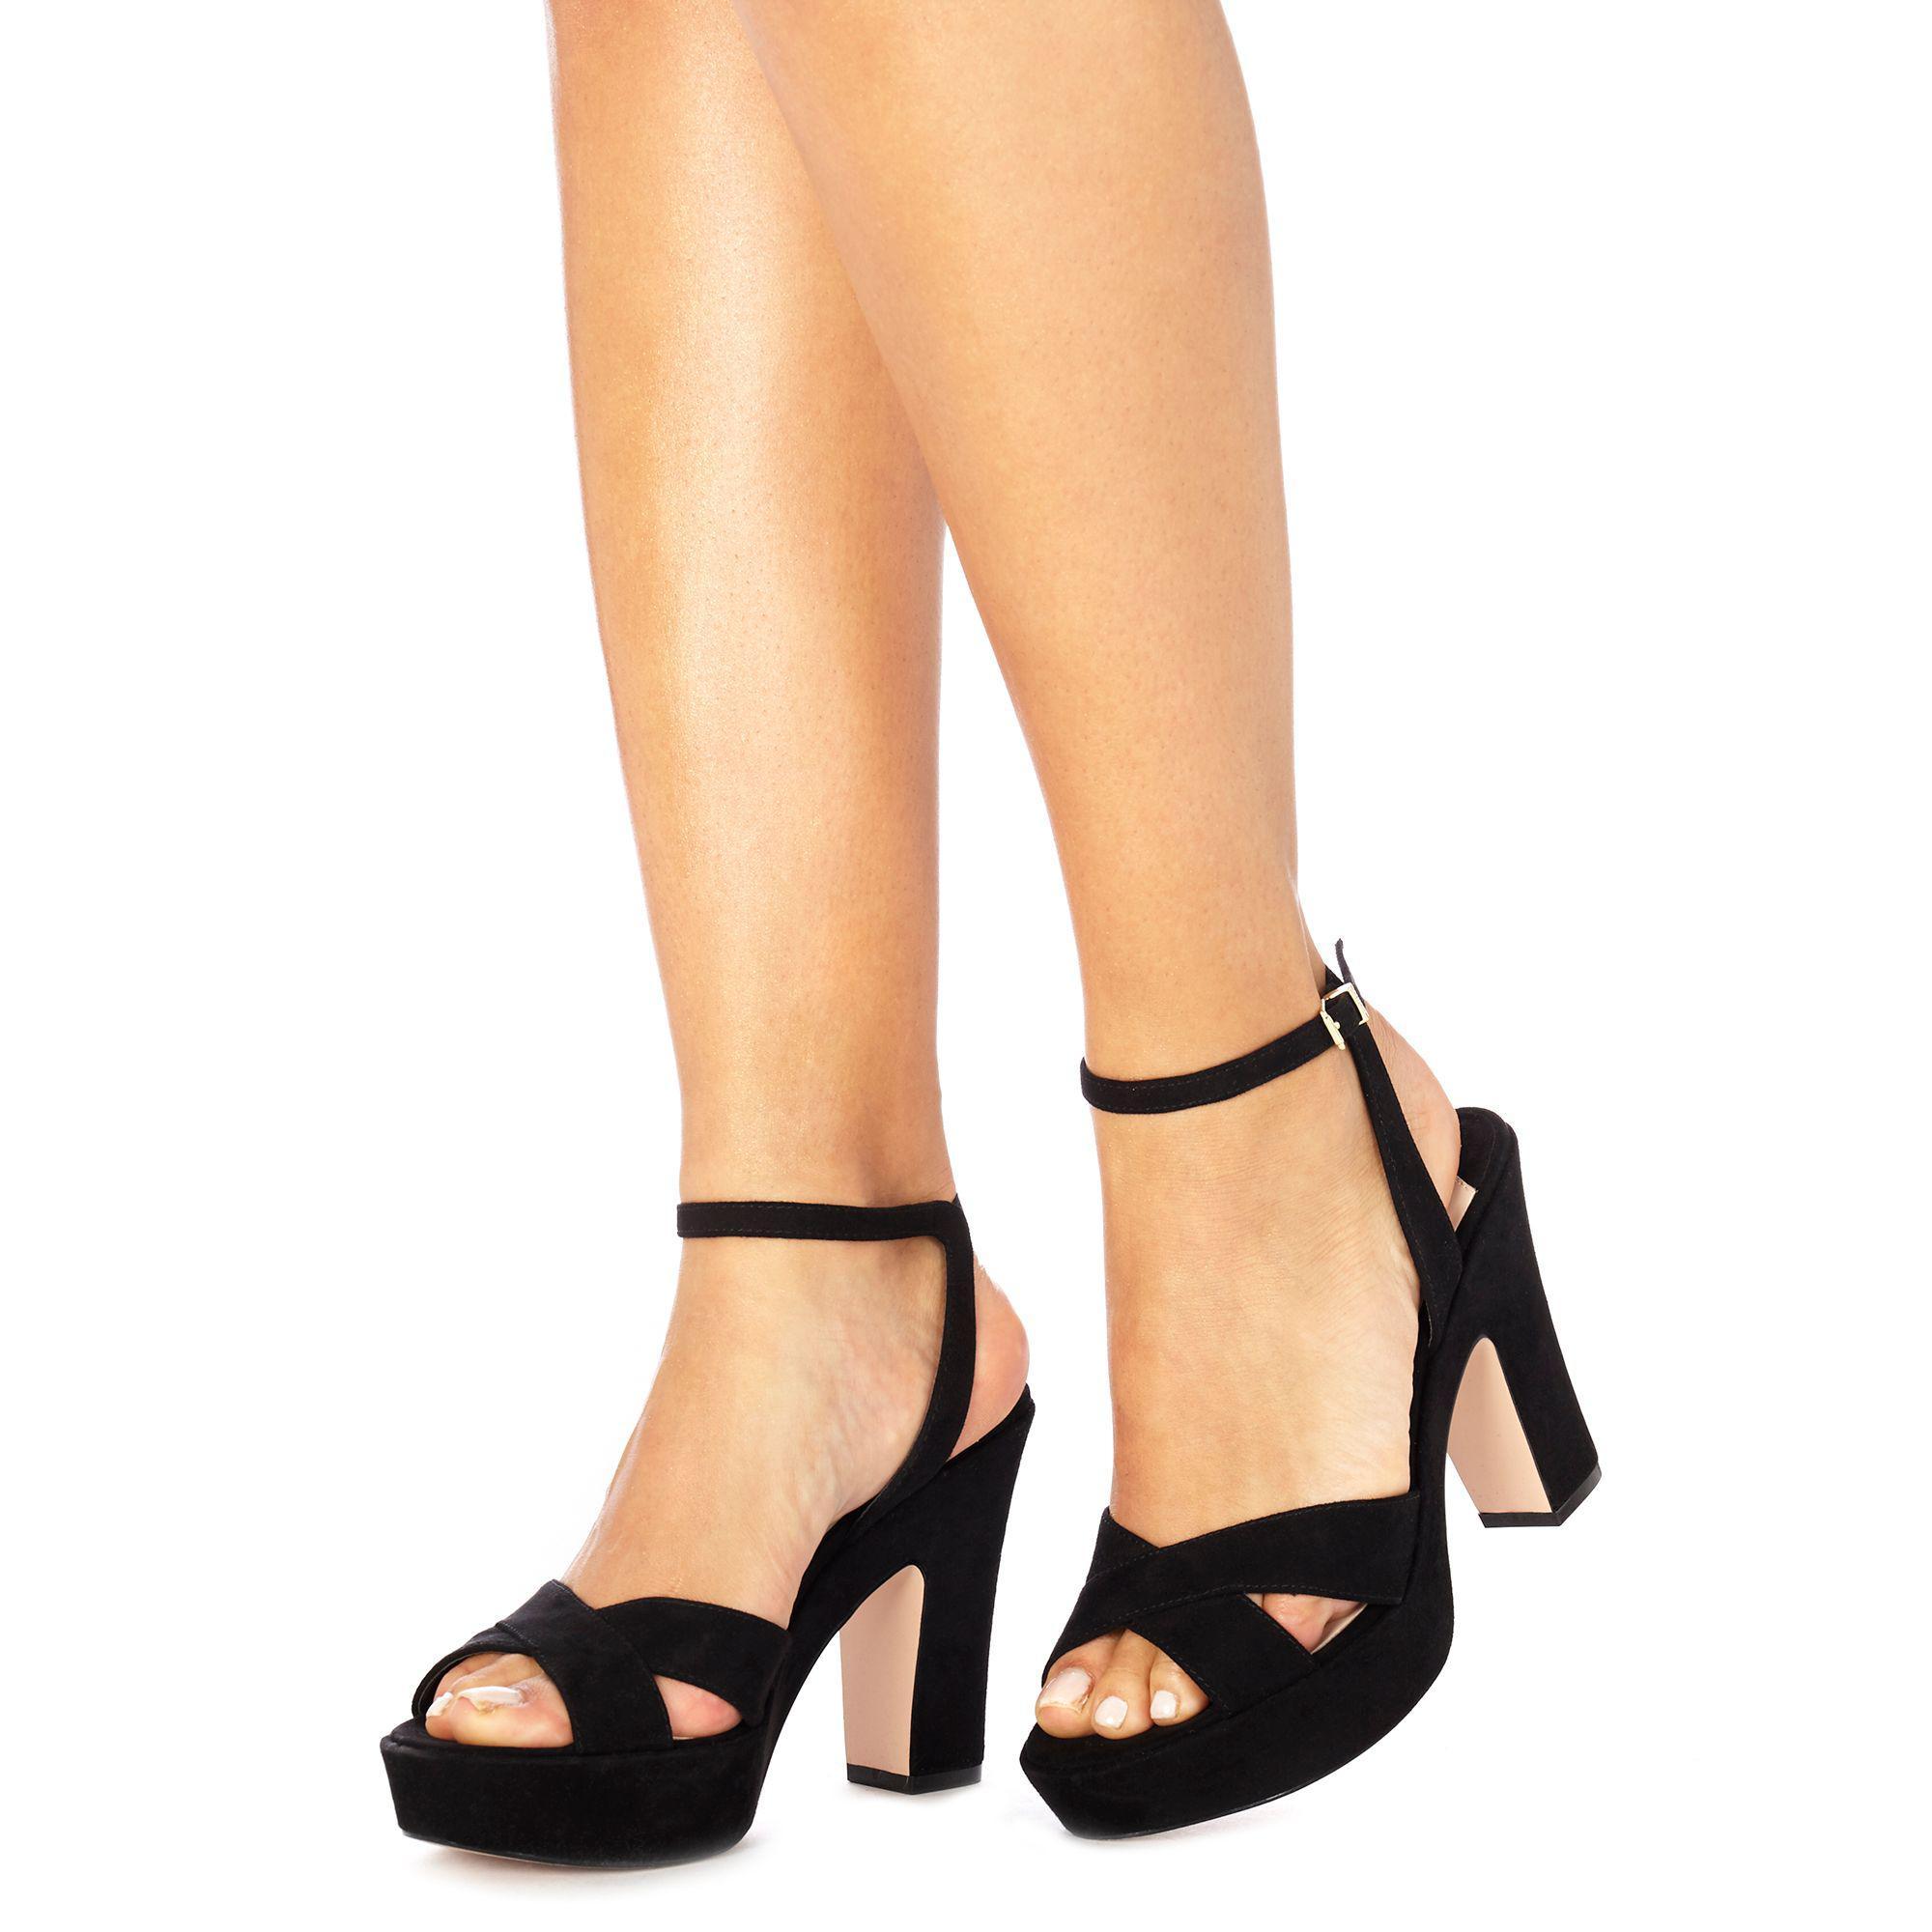 Faith DORM - High heeled sandals - black BM7kjJR